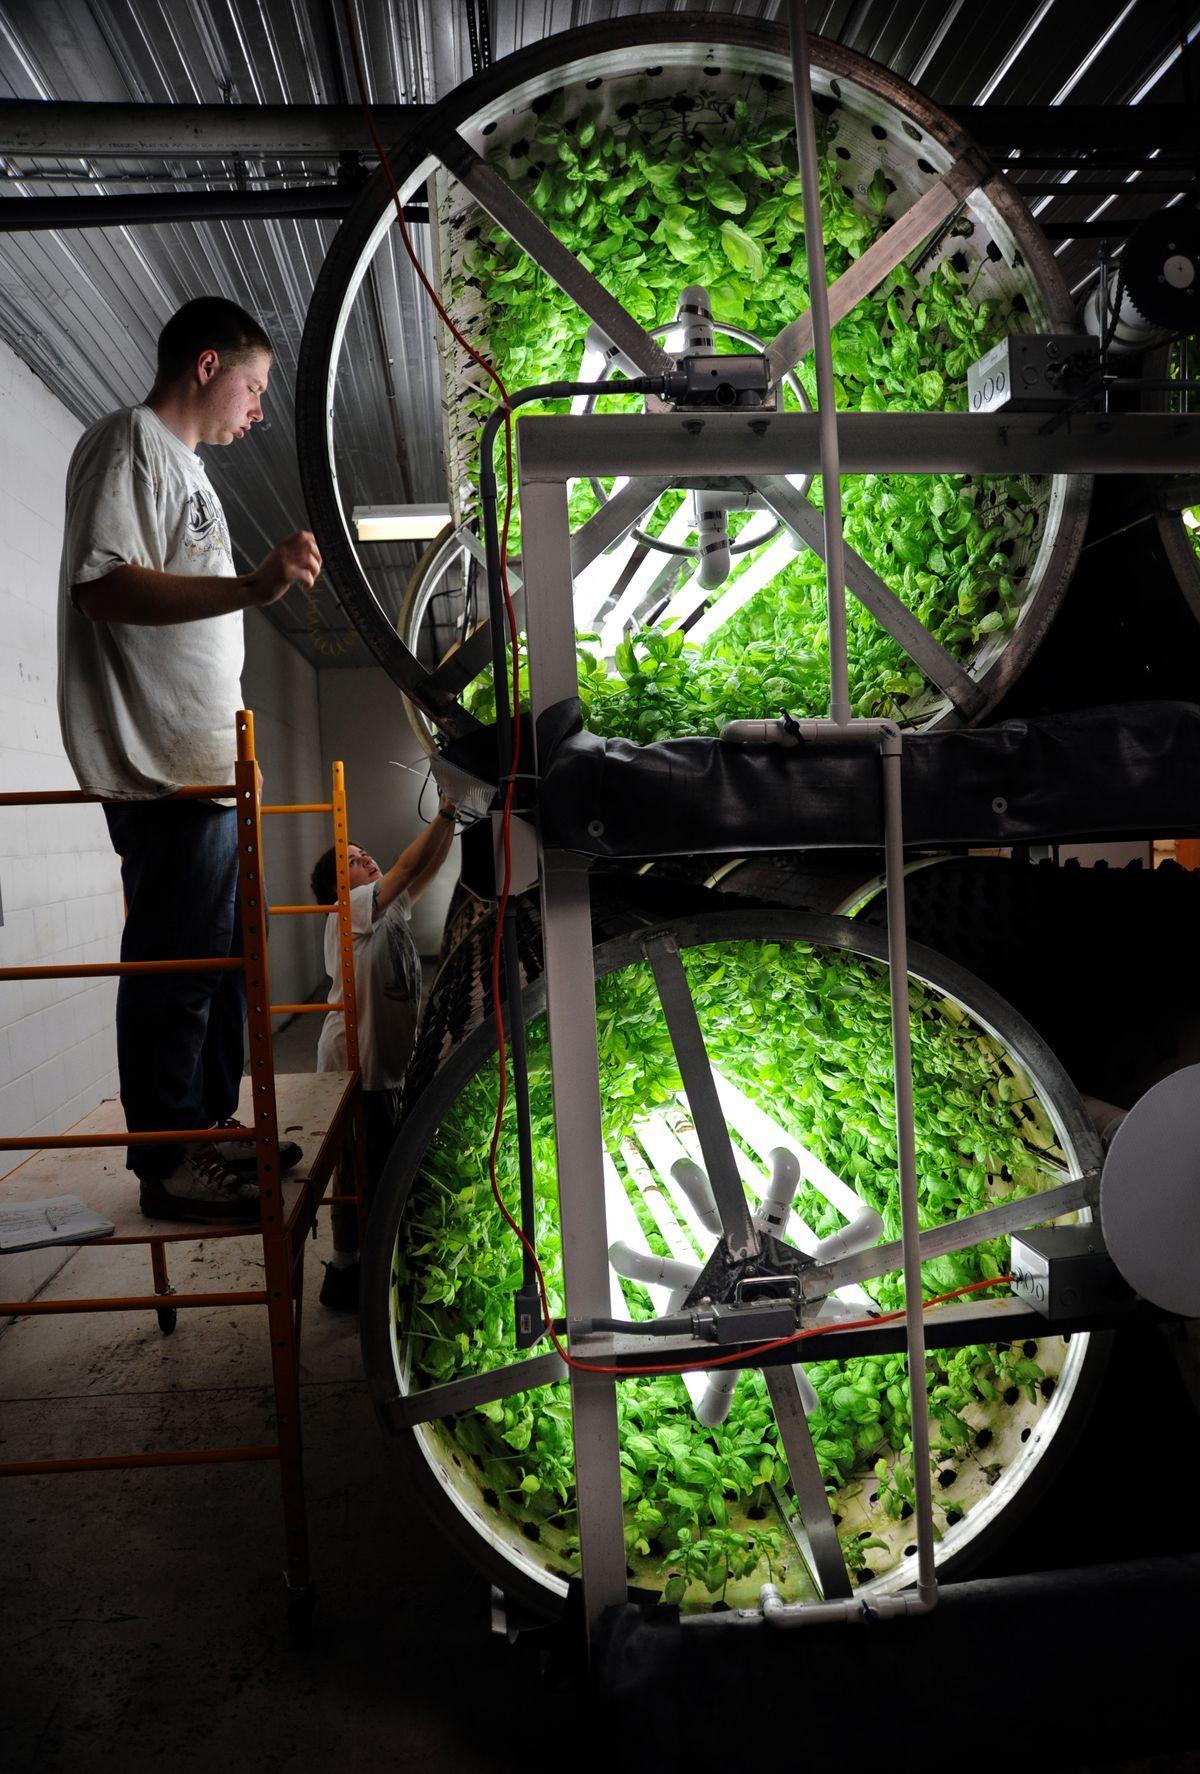 Growco Indoor Garden Supply Urban farming in a warehouse sustainable living pinterest gardens workwithnaturefo